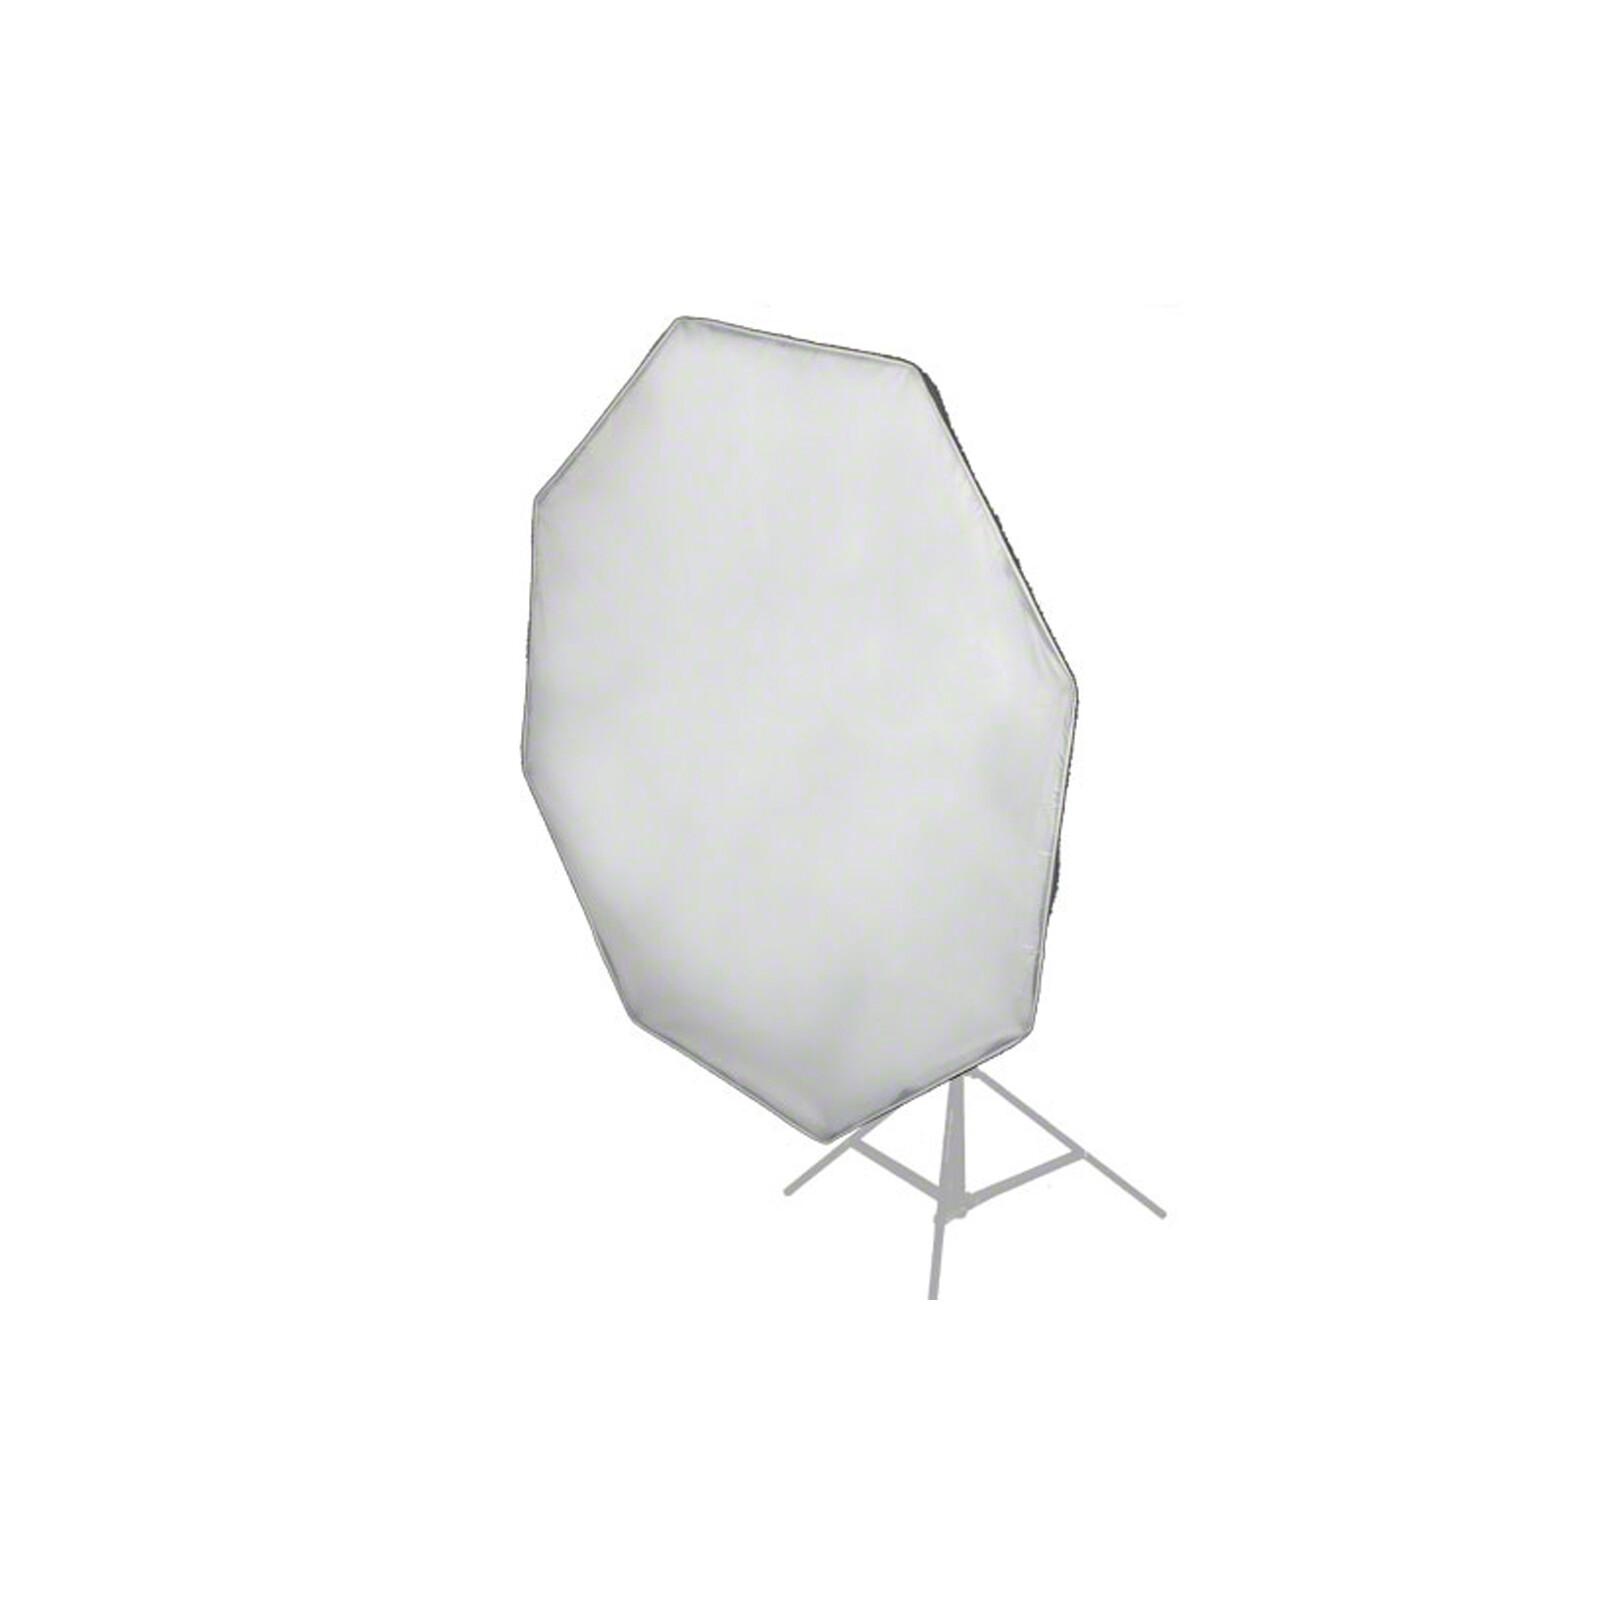 walimex pro Octagon SB Ø170cm für Multiblitz V